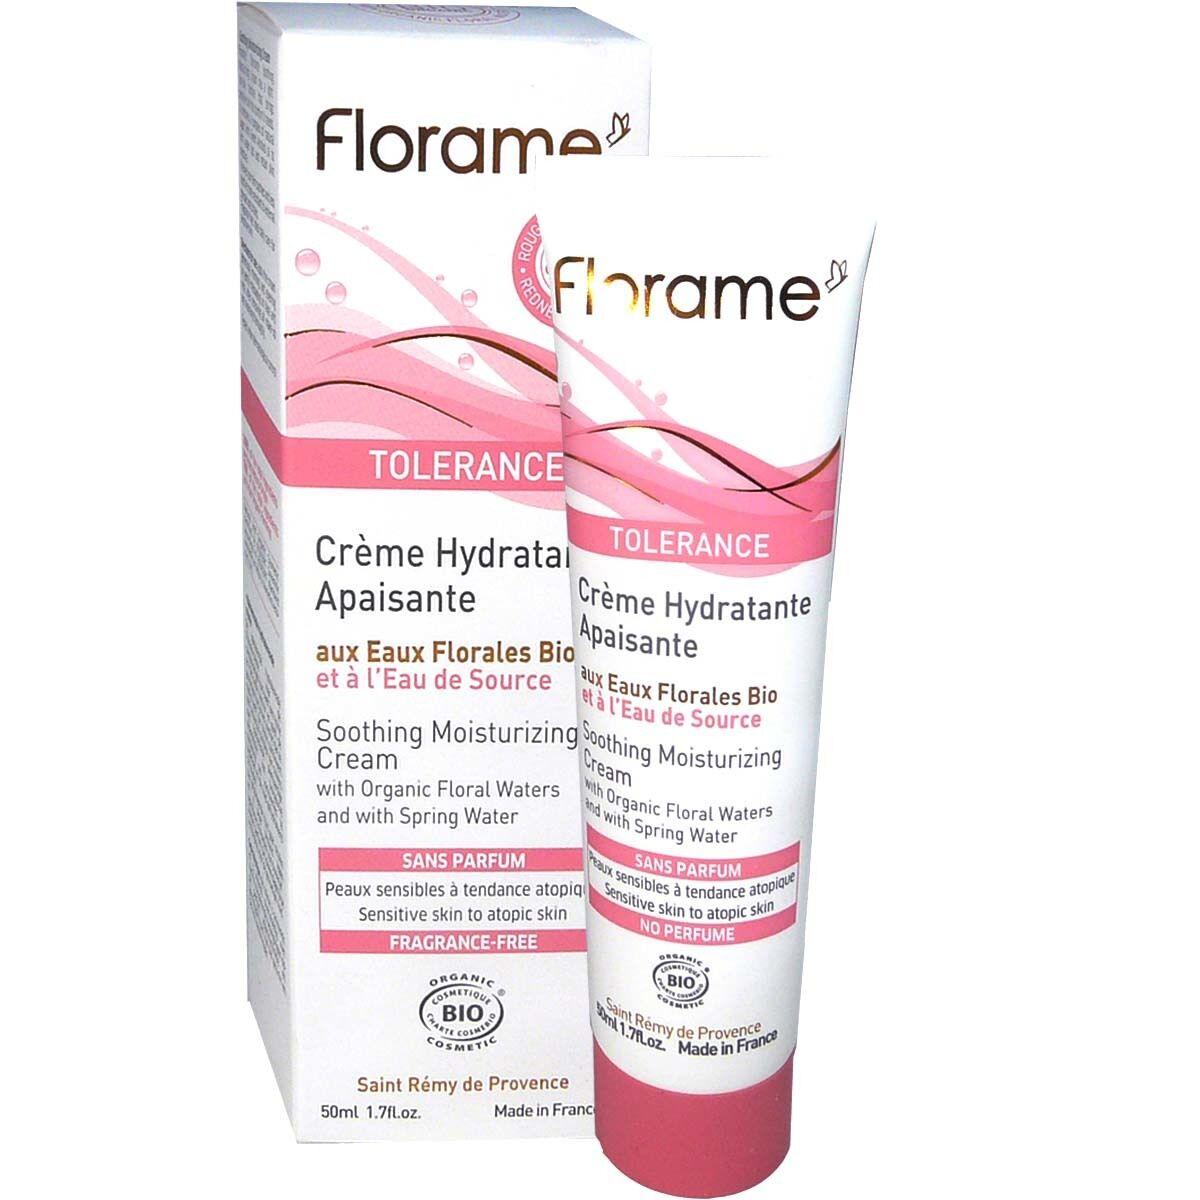 Florame tolerance creme hydratante apaisante bio 50ml